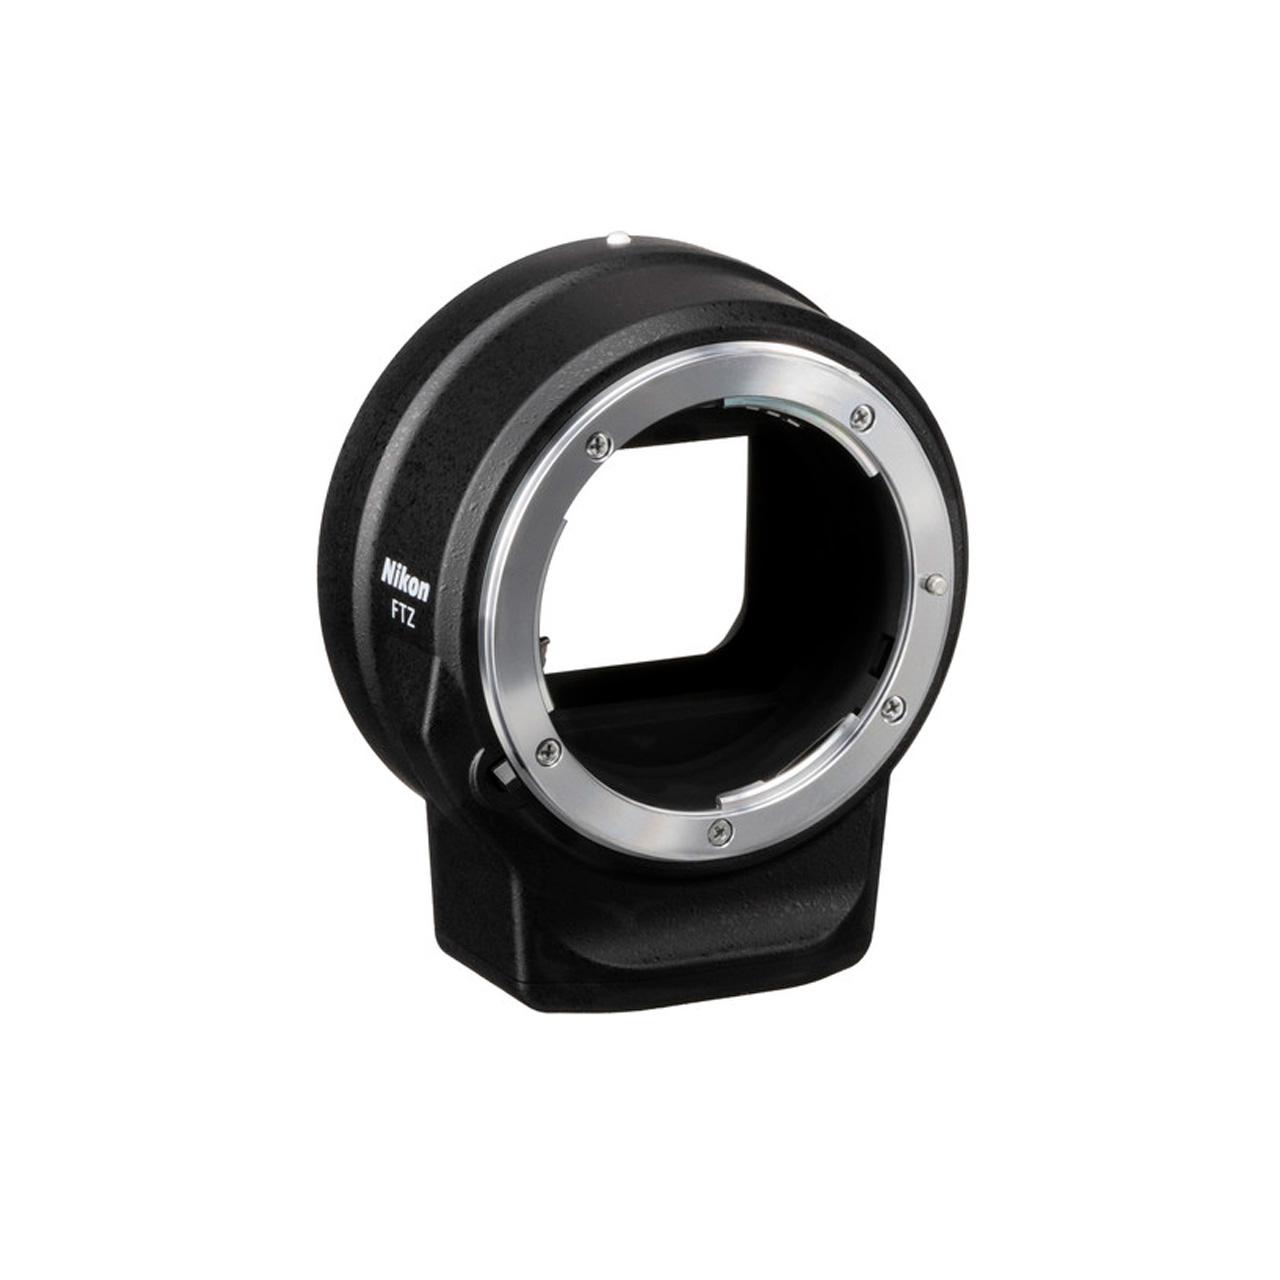 Nikon Cámara Evil Z5 Cuerpo + Adaptador FTZ Kit